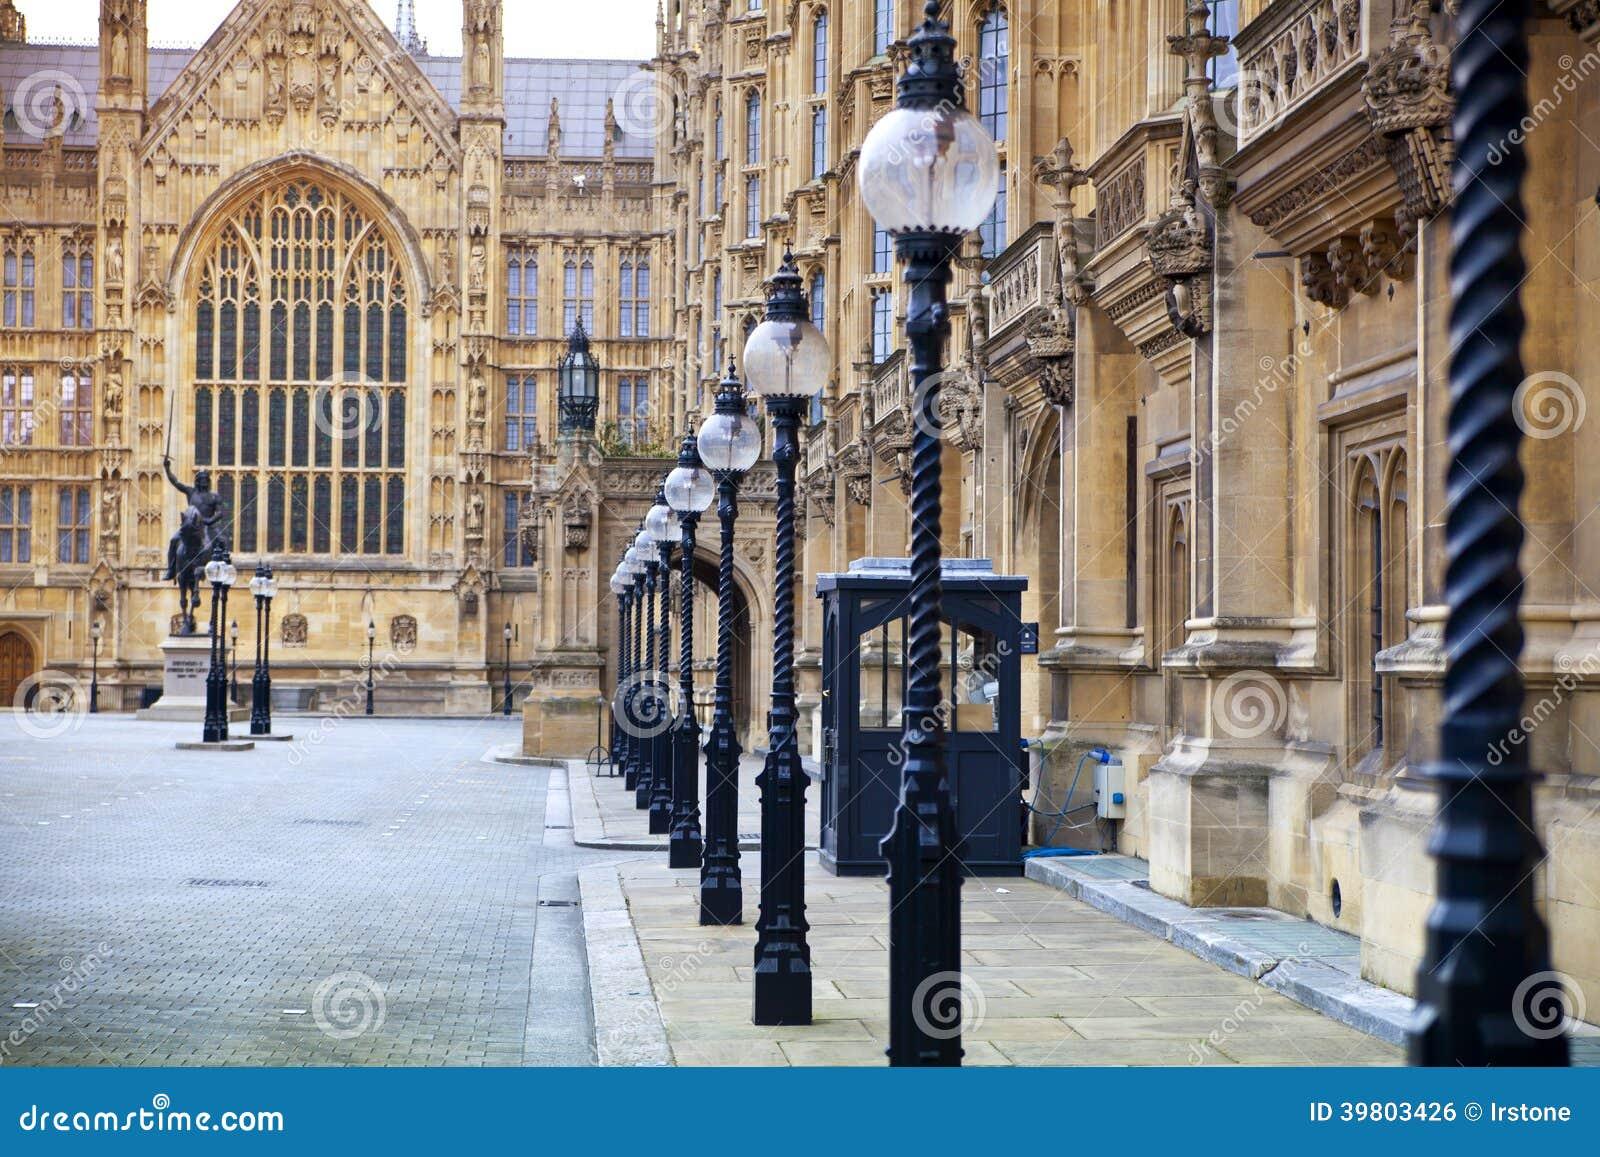 Londra westminster regno unito 5 aprile 2014 le camere for Camere parlamento